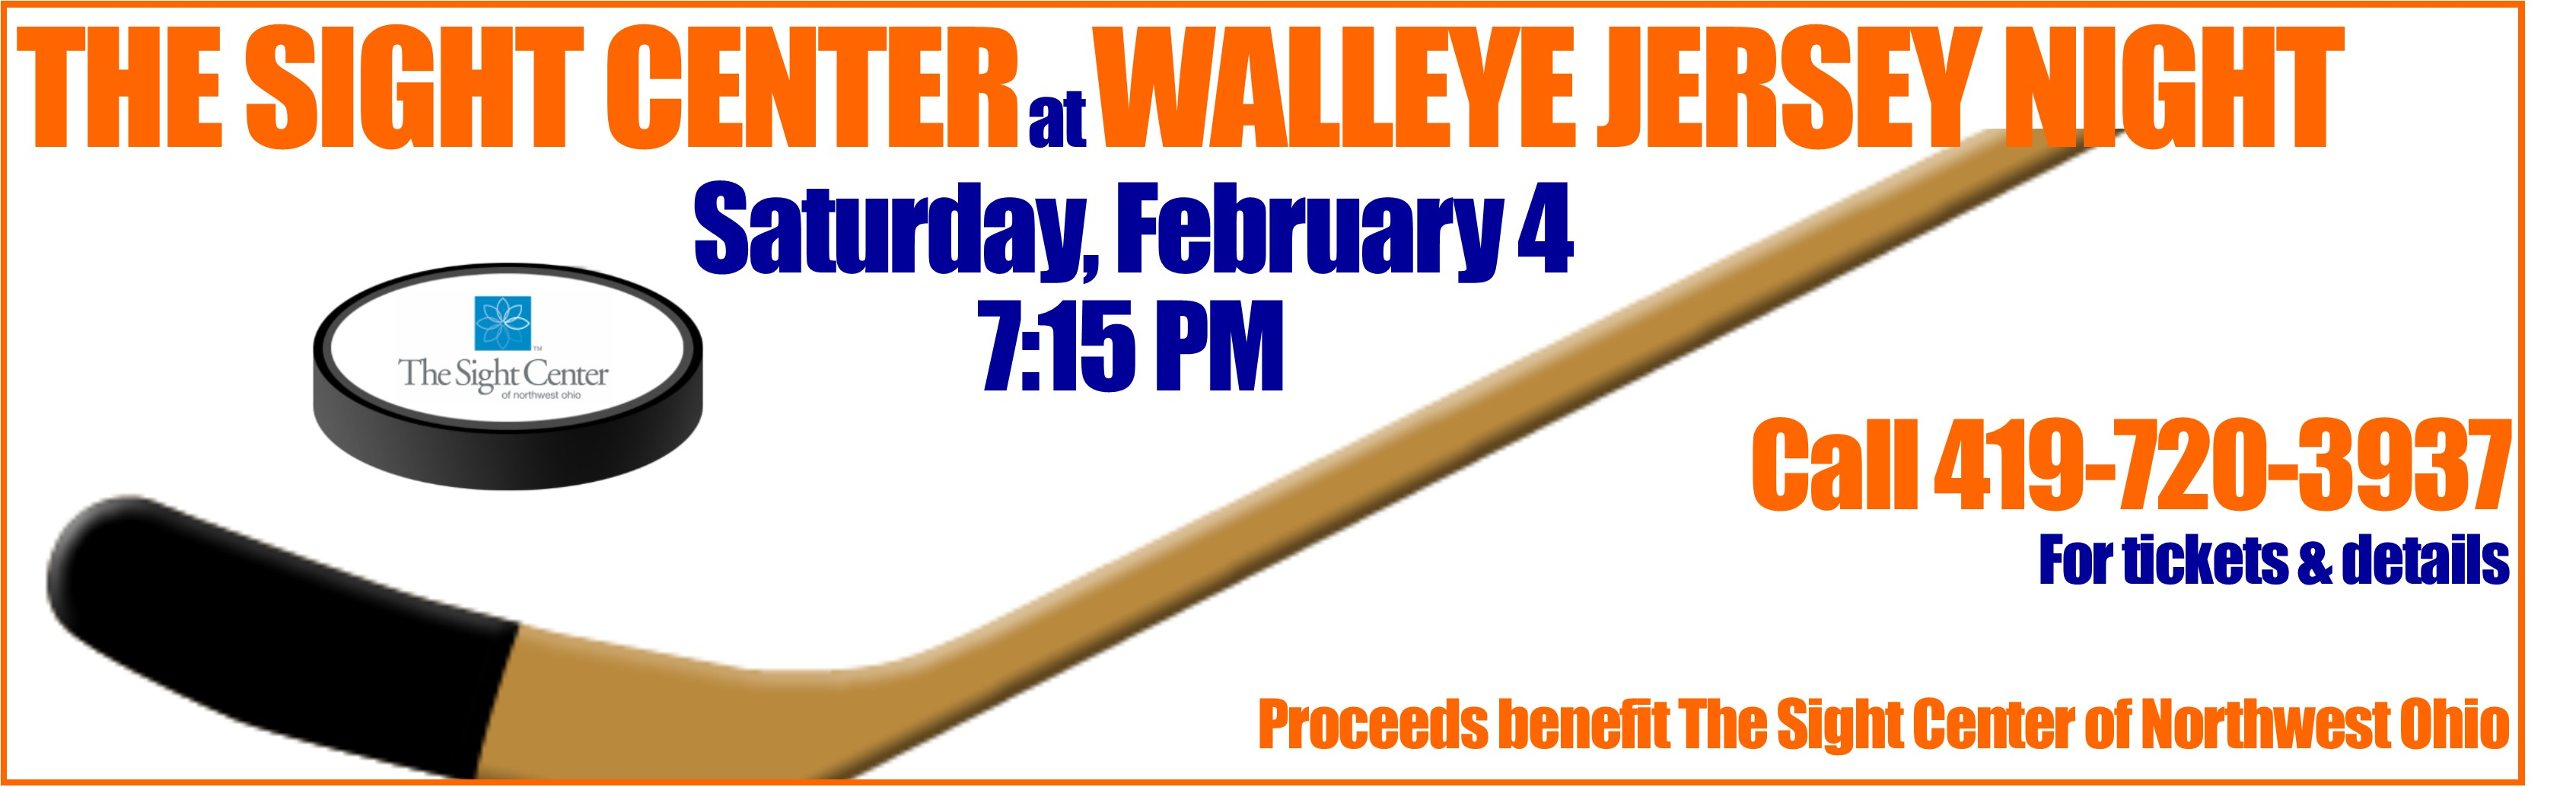 Walleye Jersey Night Fundraiser - Saturday, February 4